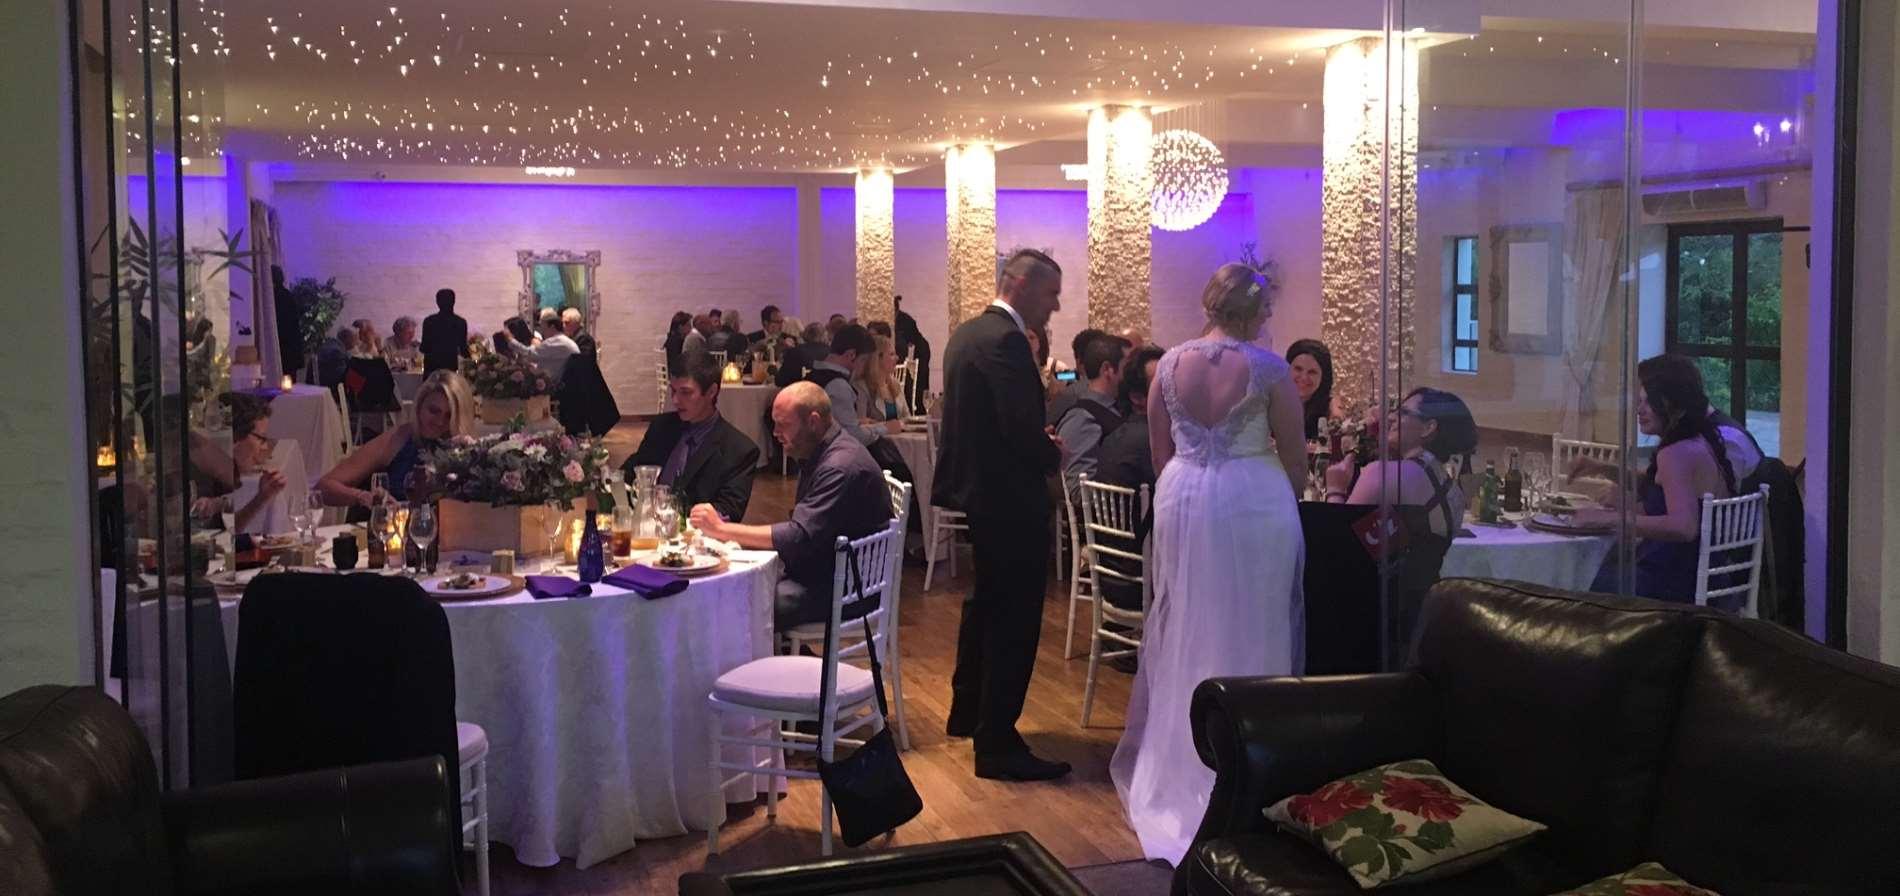 Hudsons Hall Wedding Venue Stellenbosch